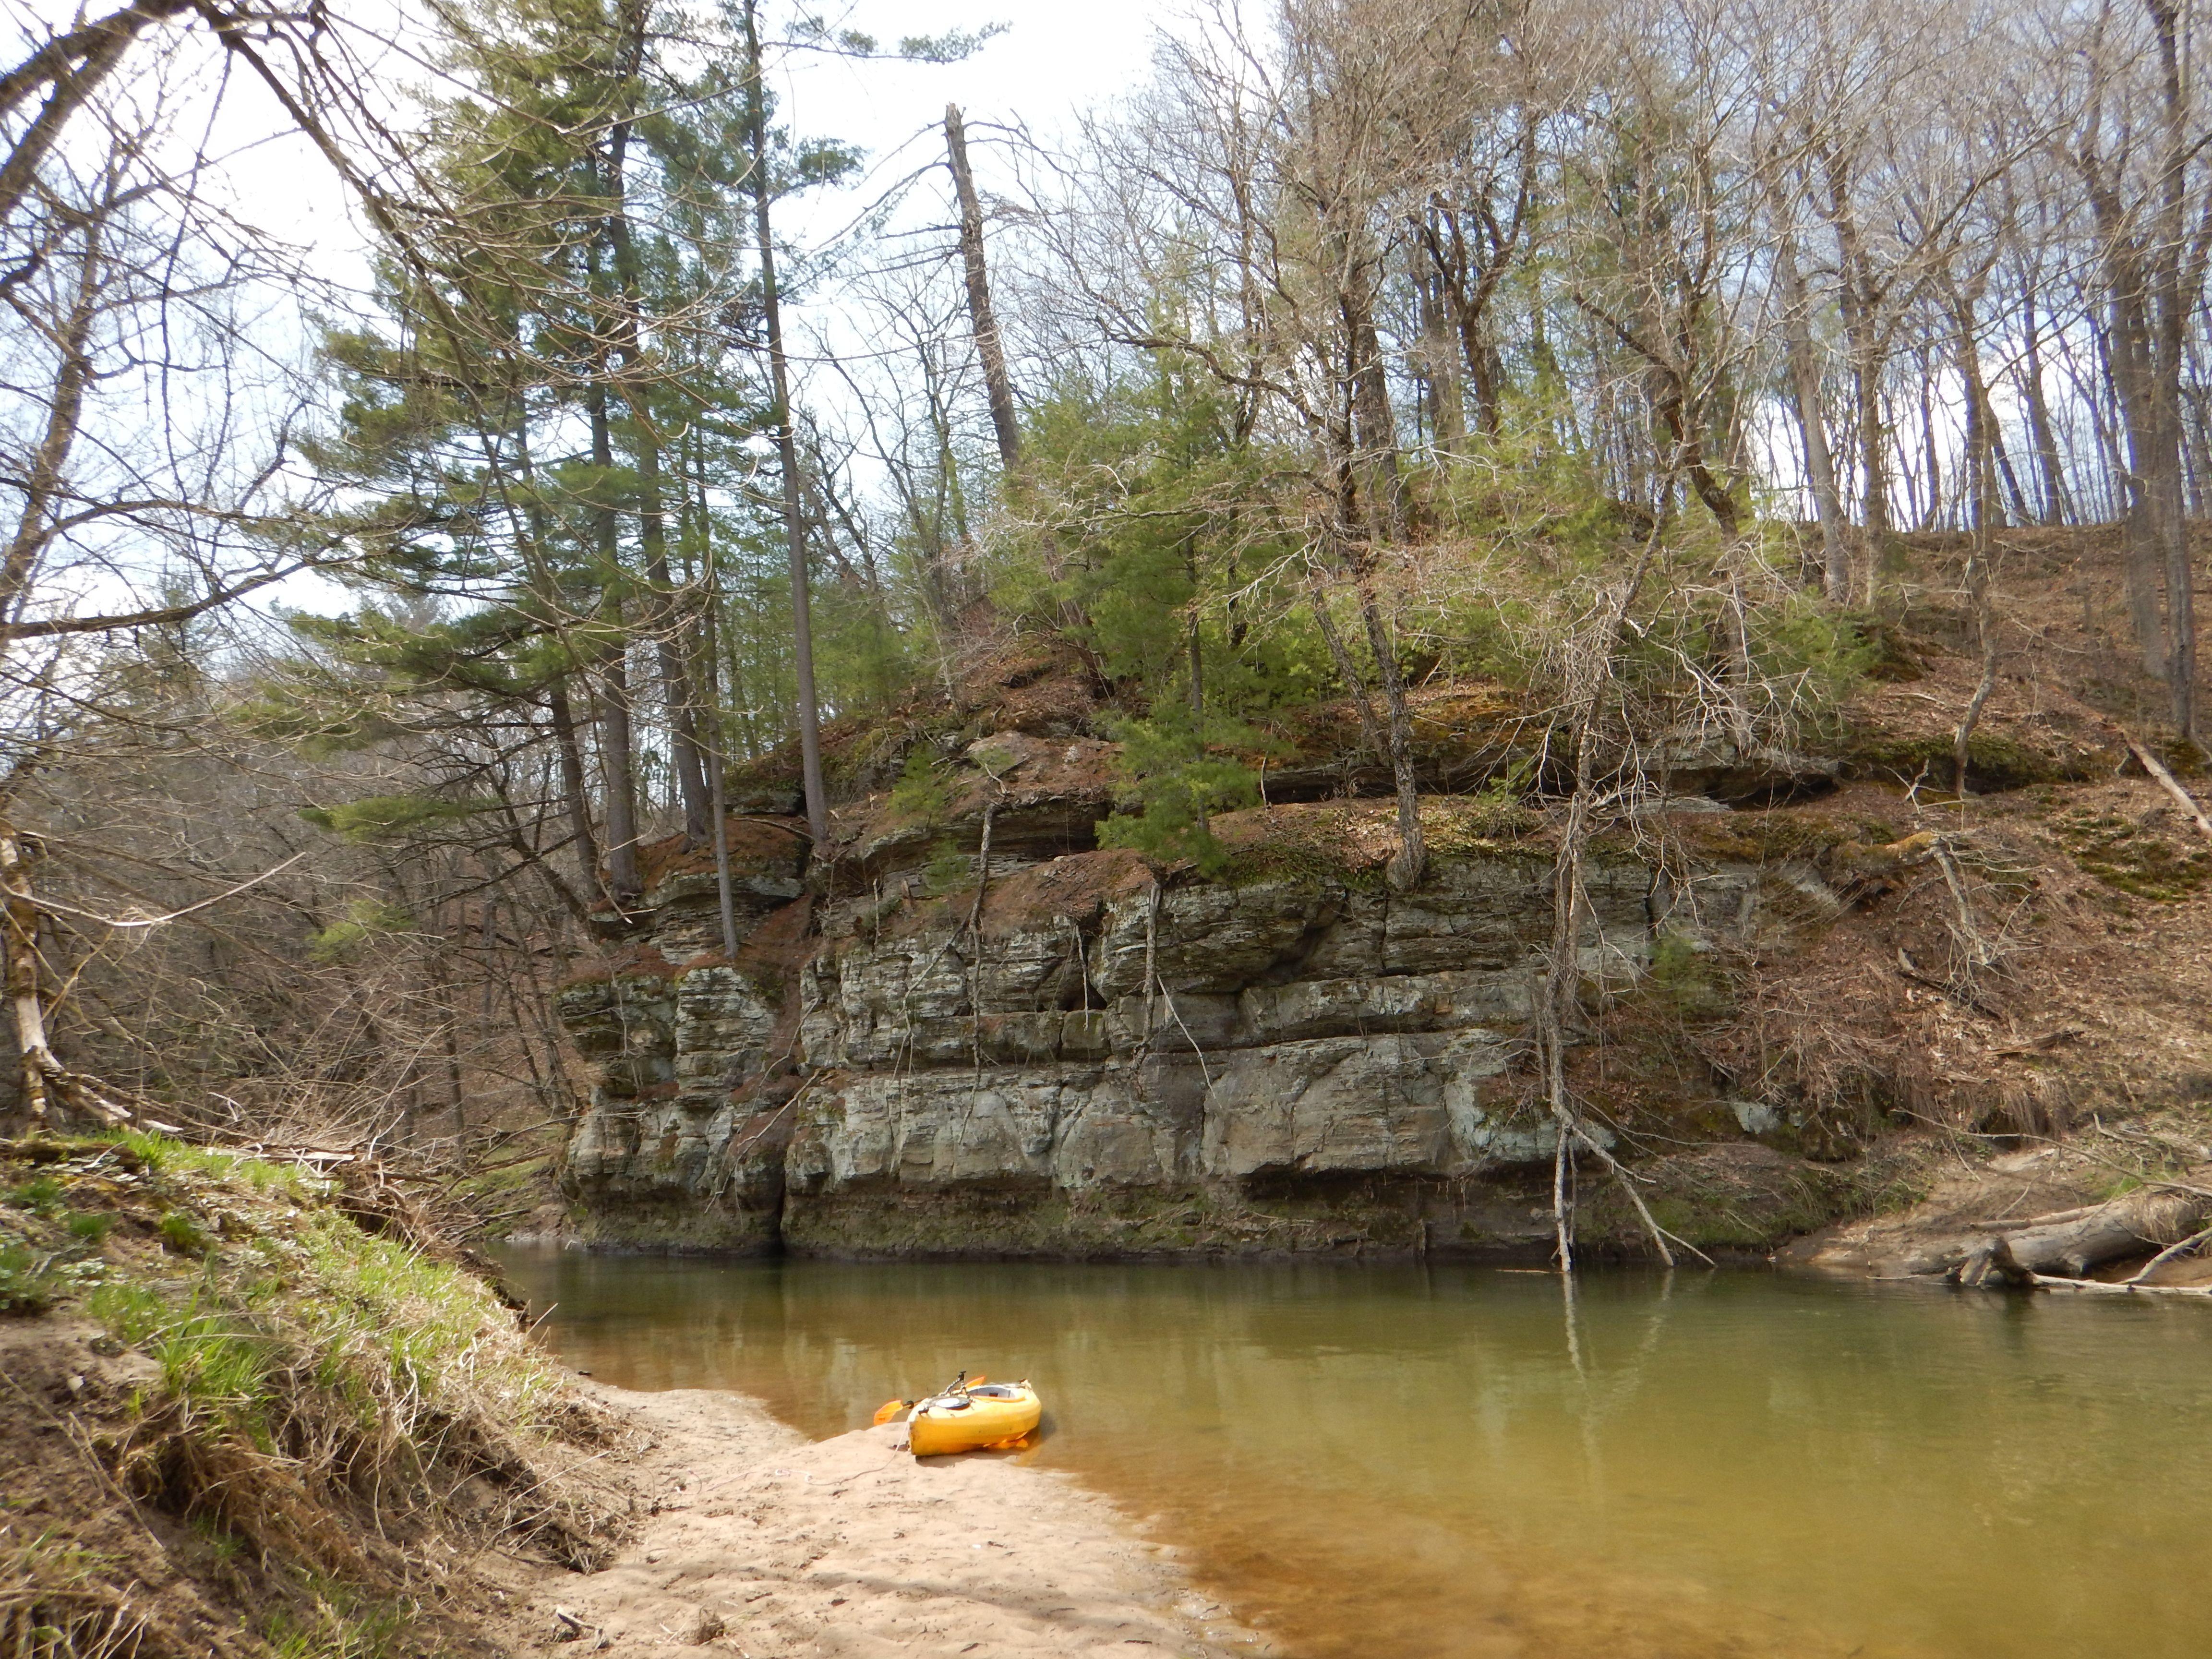 Kickapoo River Tunnelville Cliffs River trip